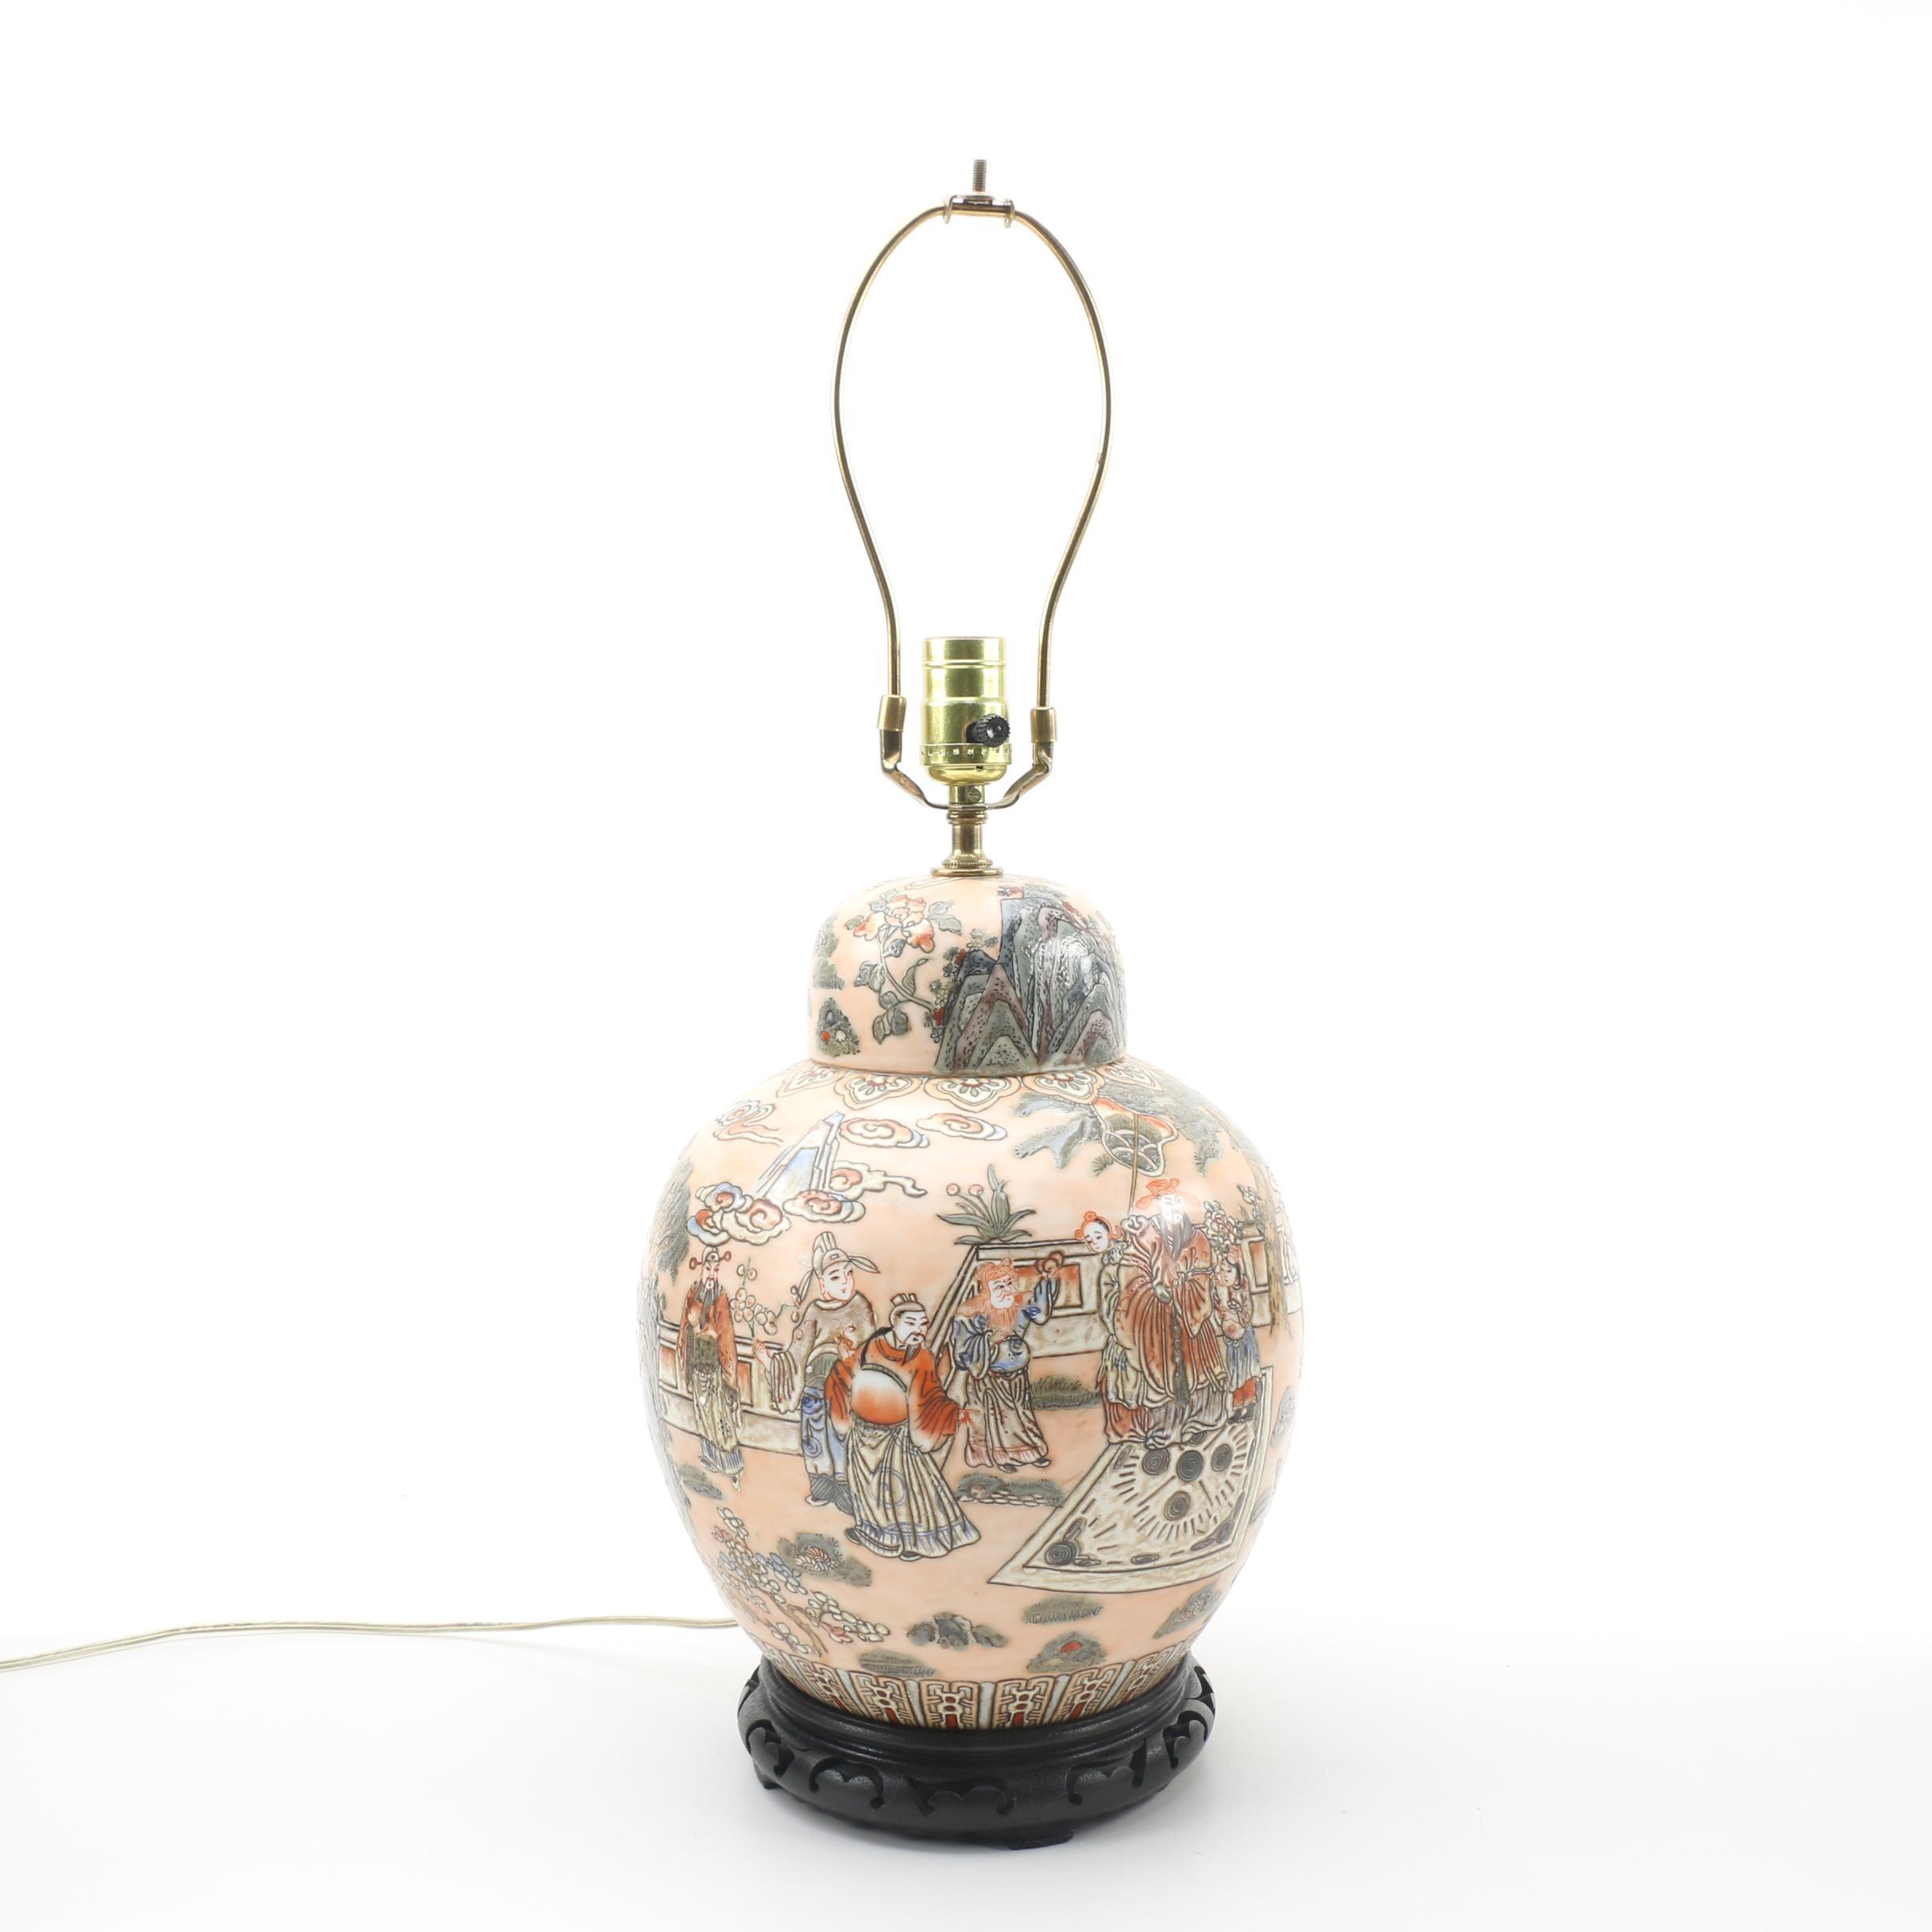 Chinese Ceramic Ginger Jar Table Lamp